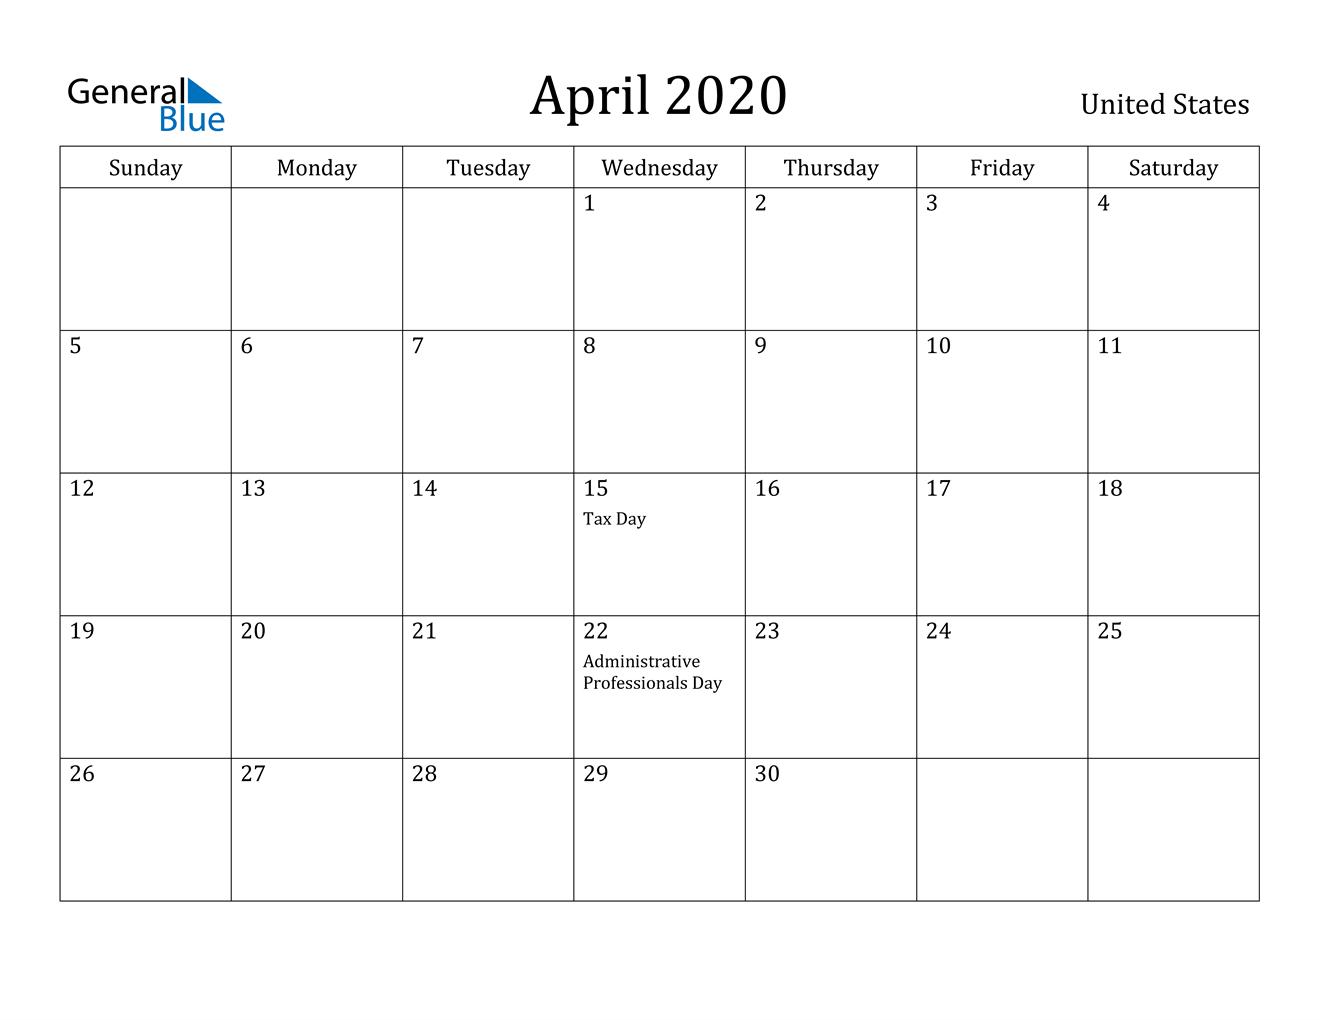 April 2020 Calendar - United States